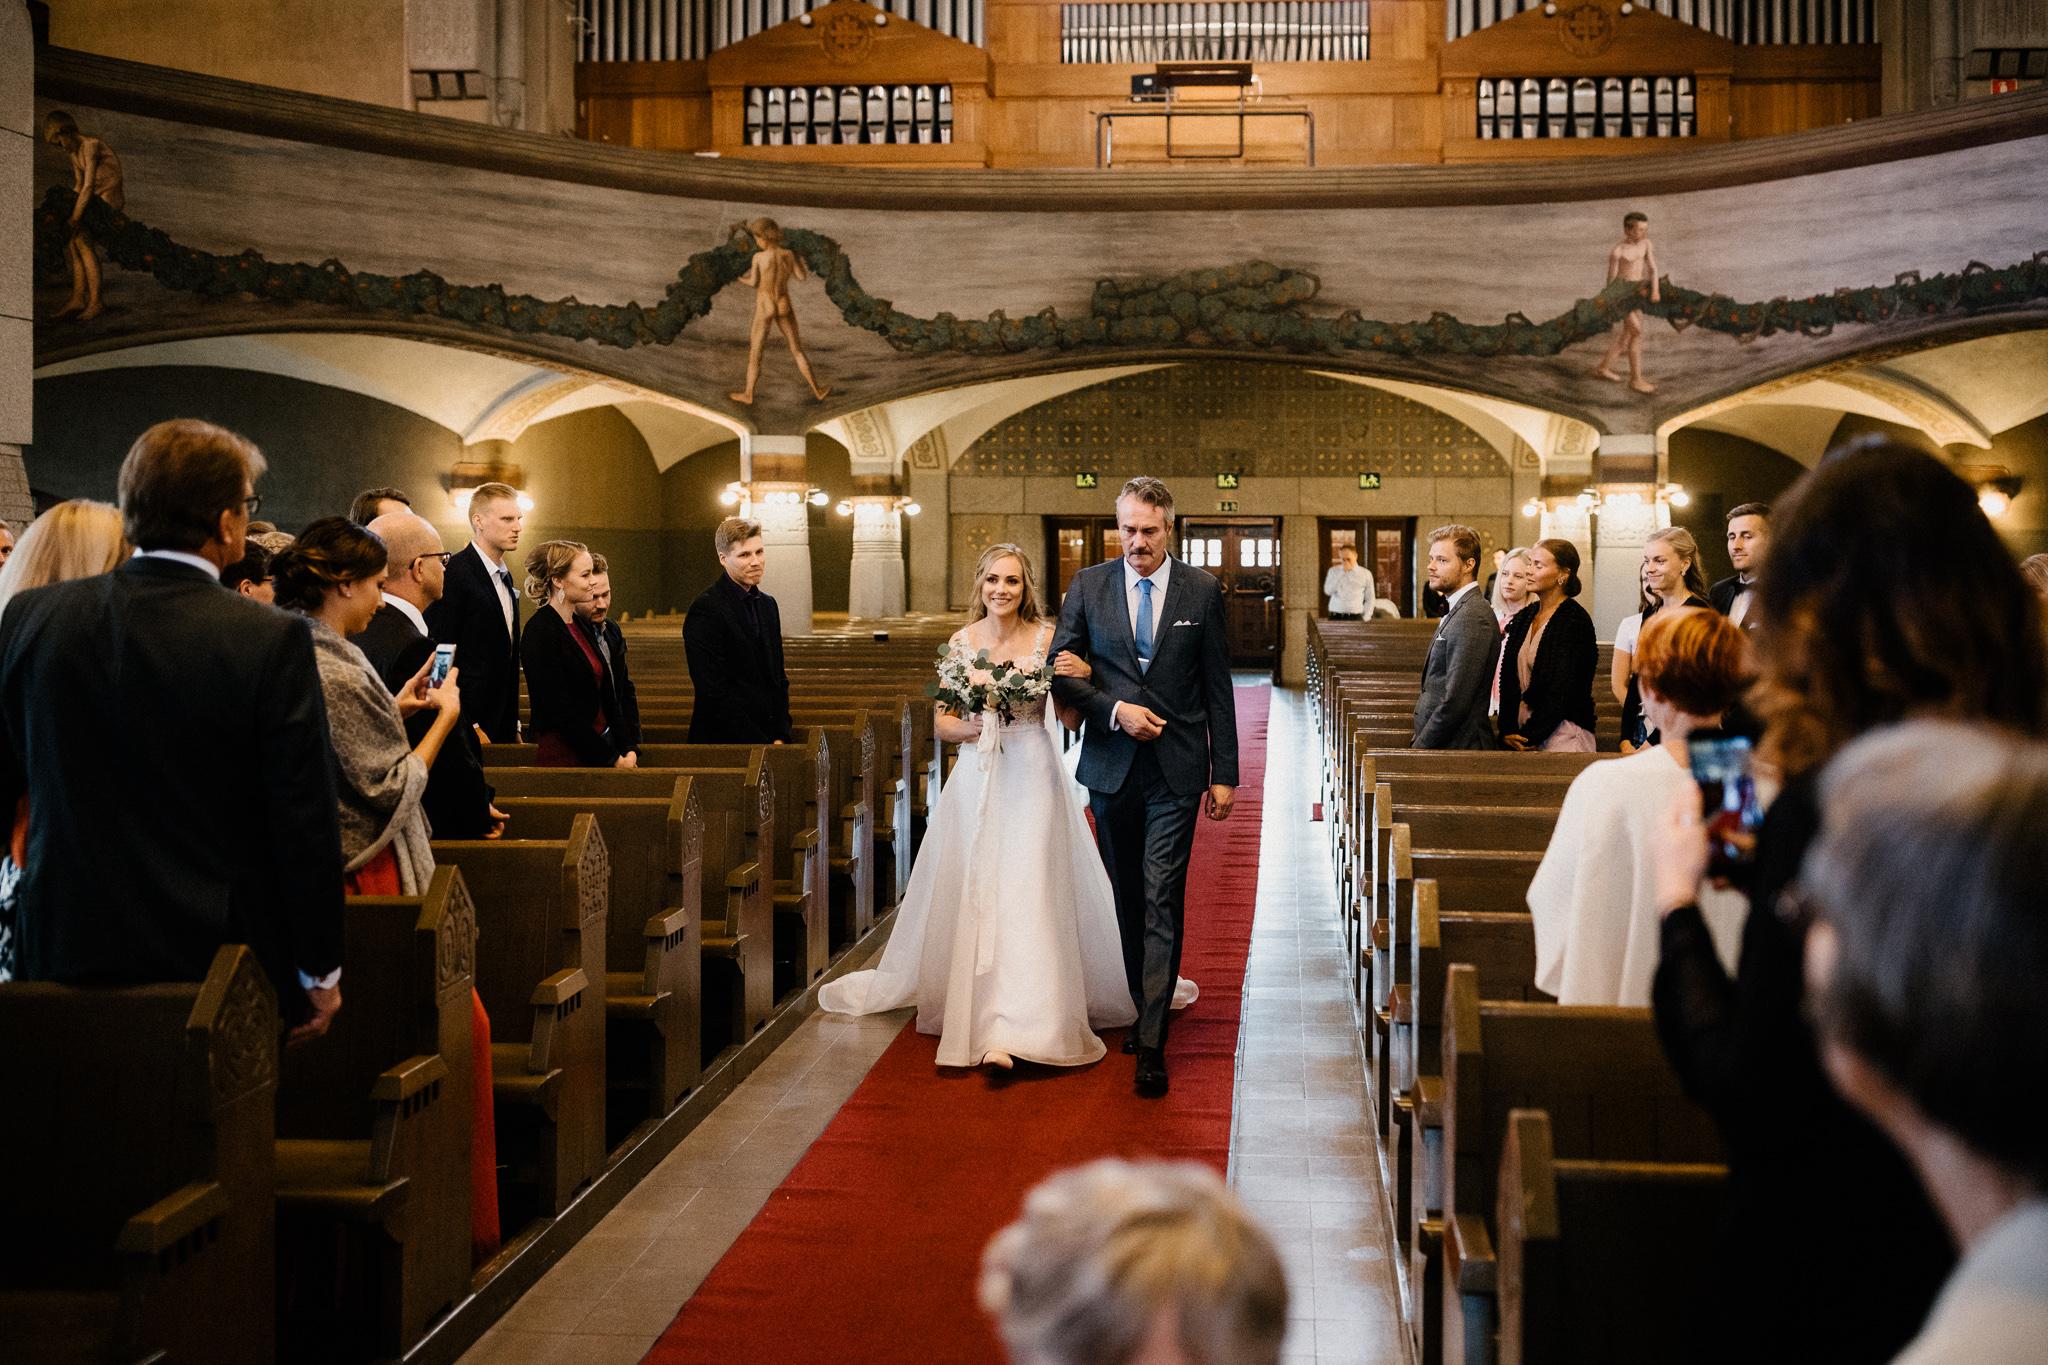 Johanna + Mikko - Tampere - Photo by Patrick Karkkolainen Wedding Photographer-60.jpg